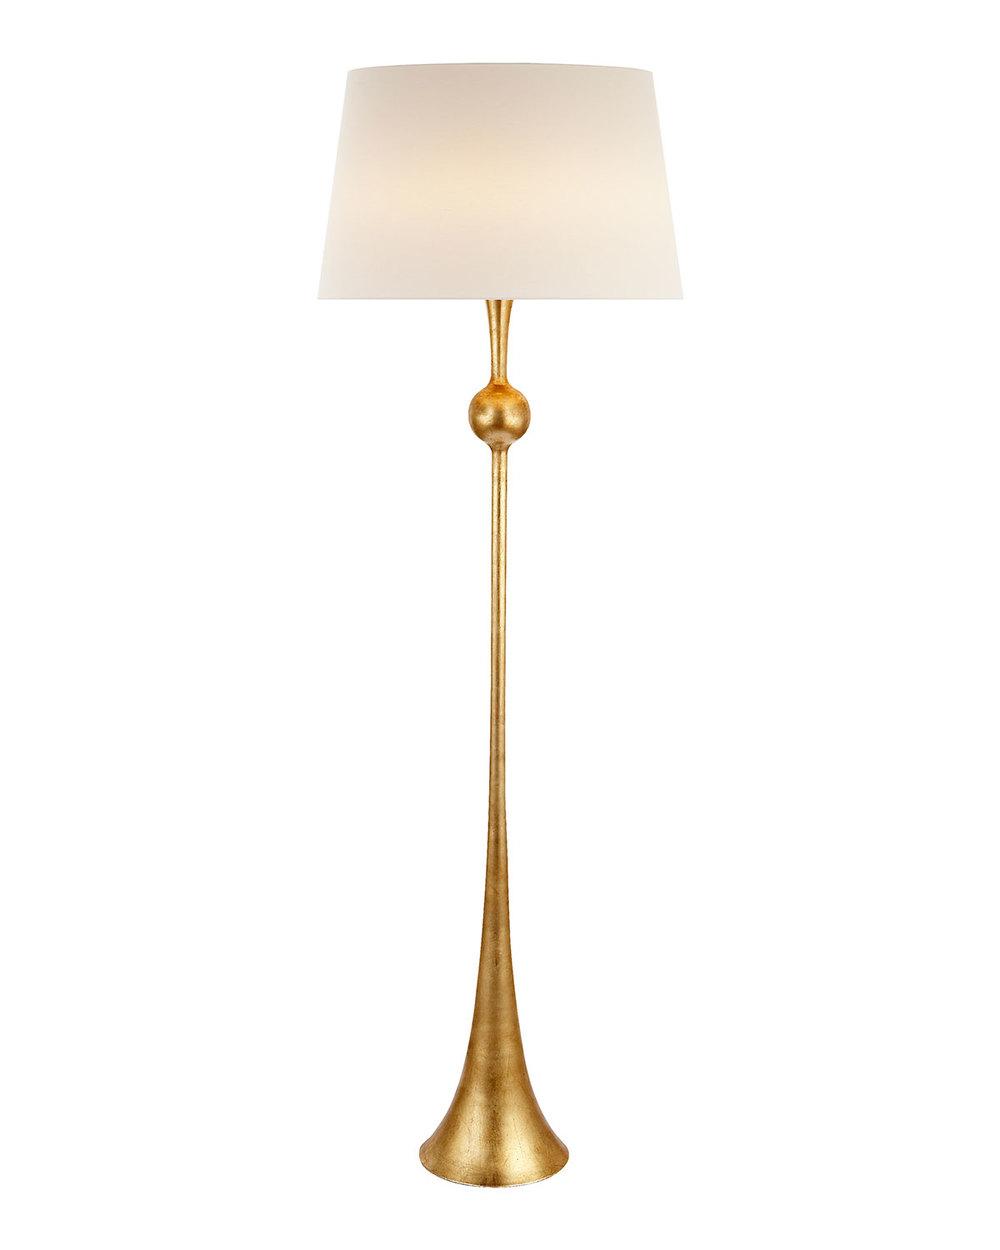 Visual comfort chandelier at home and interior design ideas elegant aerin golden floor lamp petite linen barrel chair john richard beaded chandelier warner tufted linen arubaitofo Choice Image